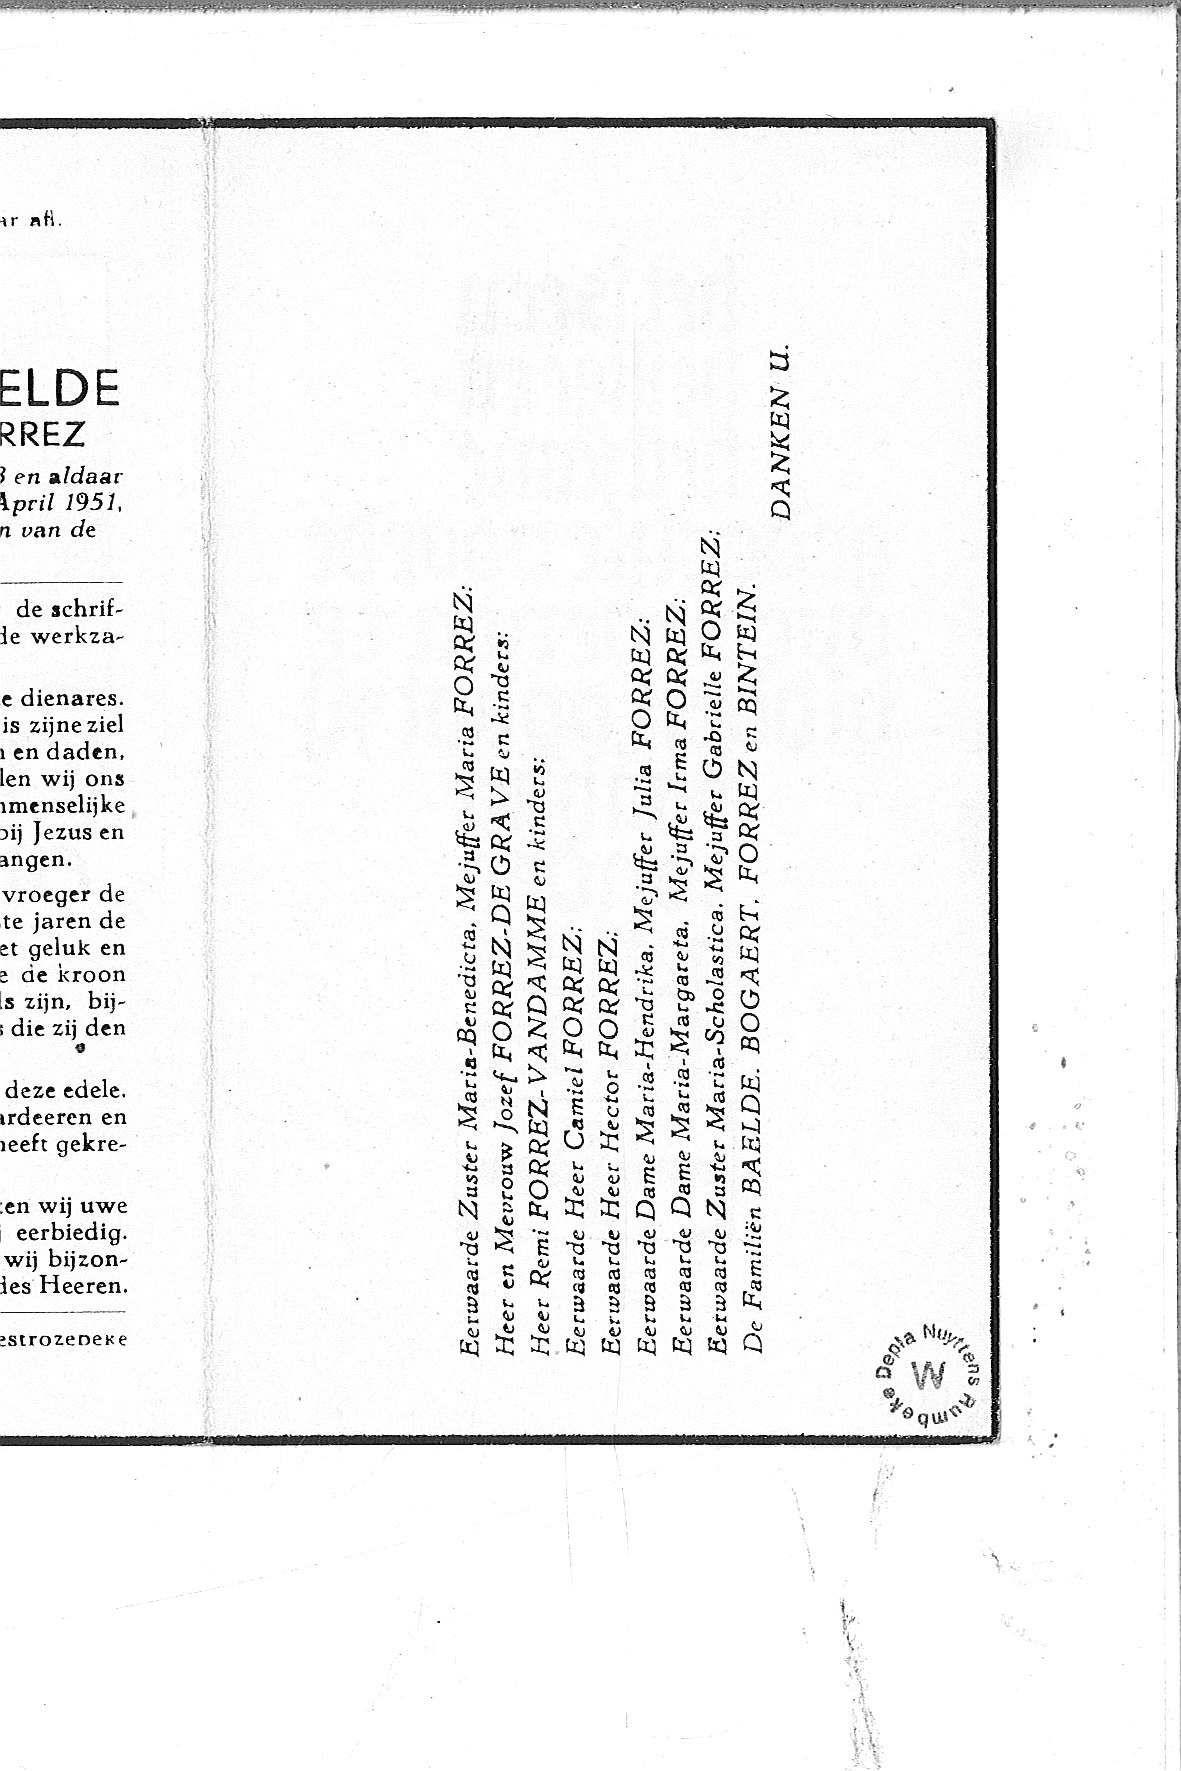 Felicie-Maria(1951)20130826105243_00090.jpg